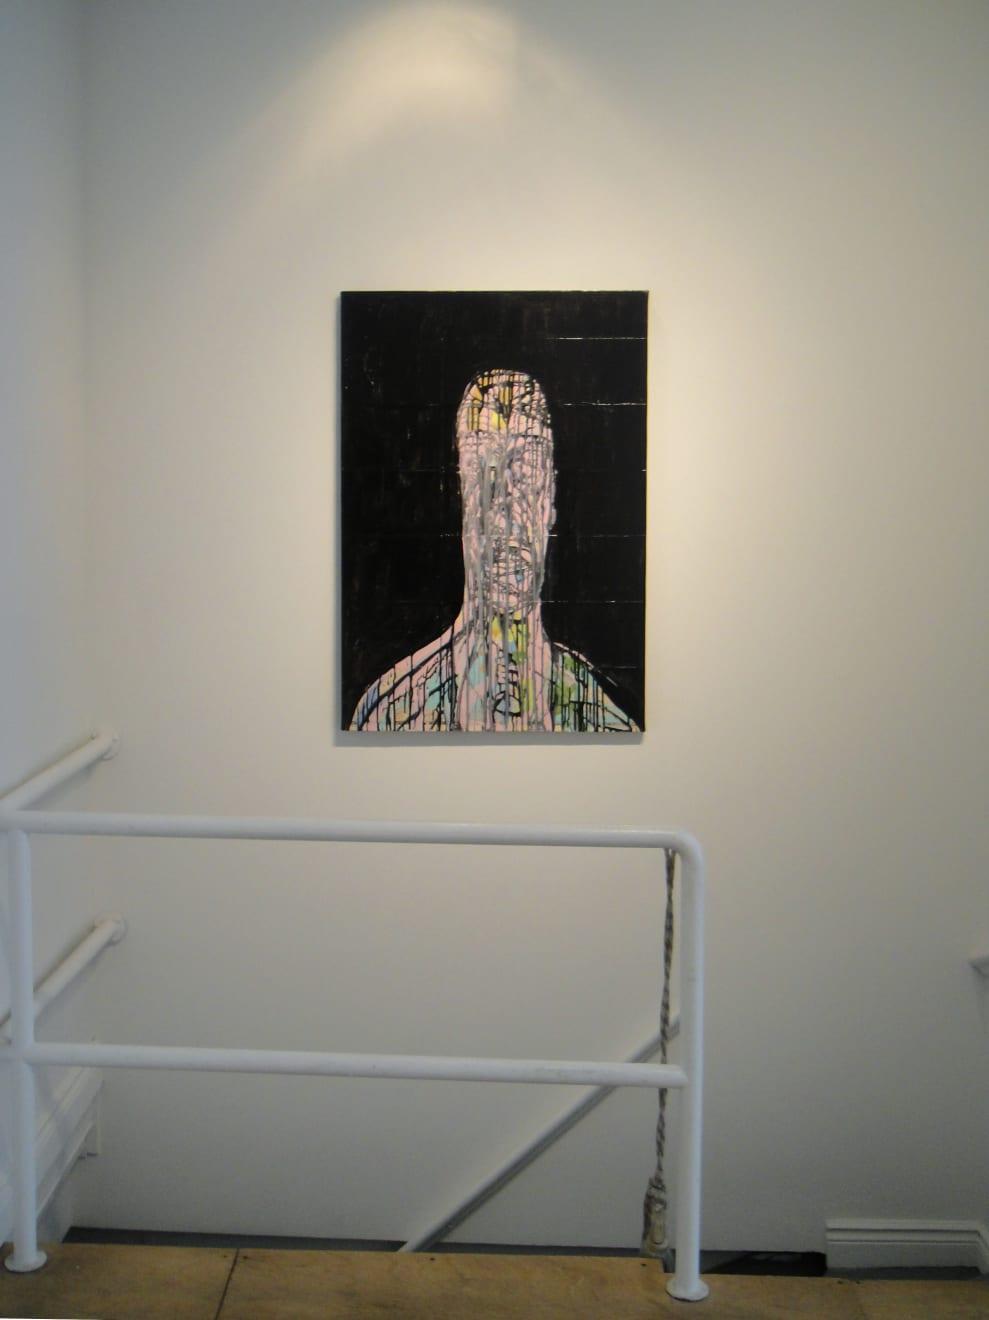 Angell Gallery, Toronto, Ontario